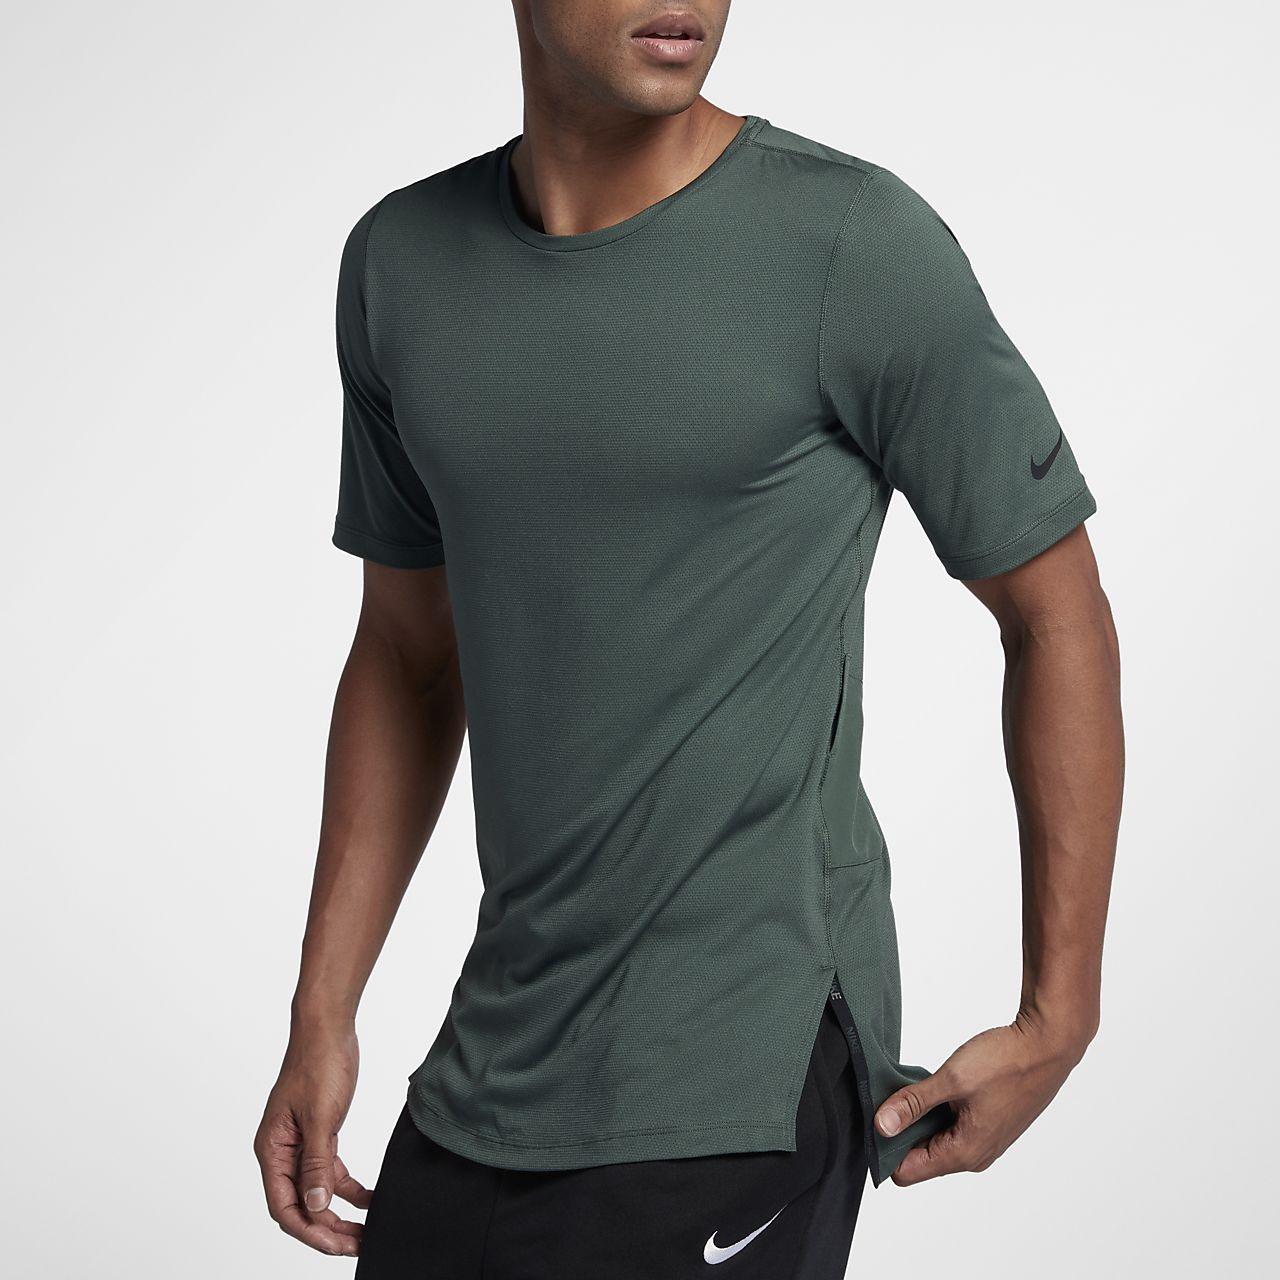 ... Nike Training Utility Men's Short-Sleeve Top